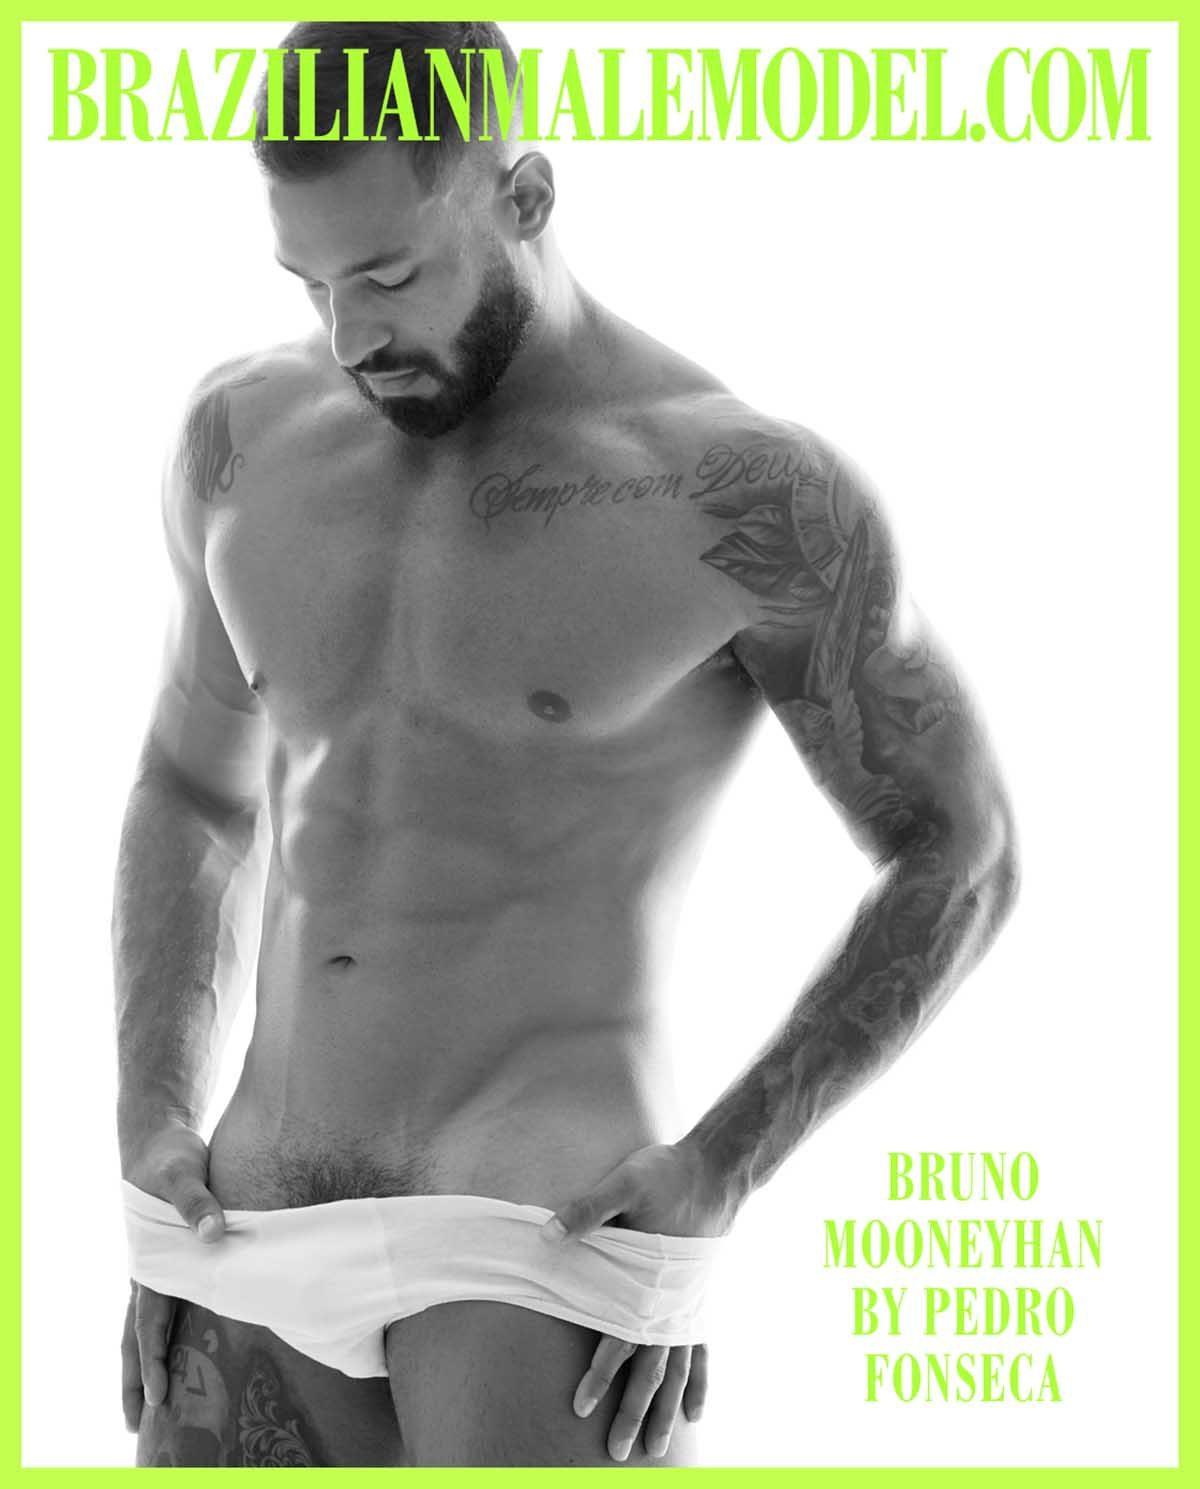 Bruno Mooneyhan by Pedro Fonseca